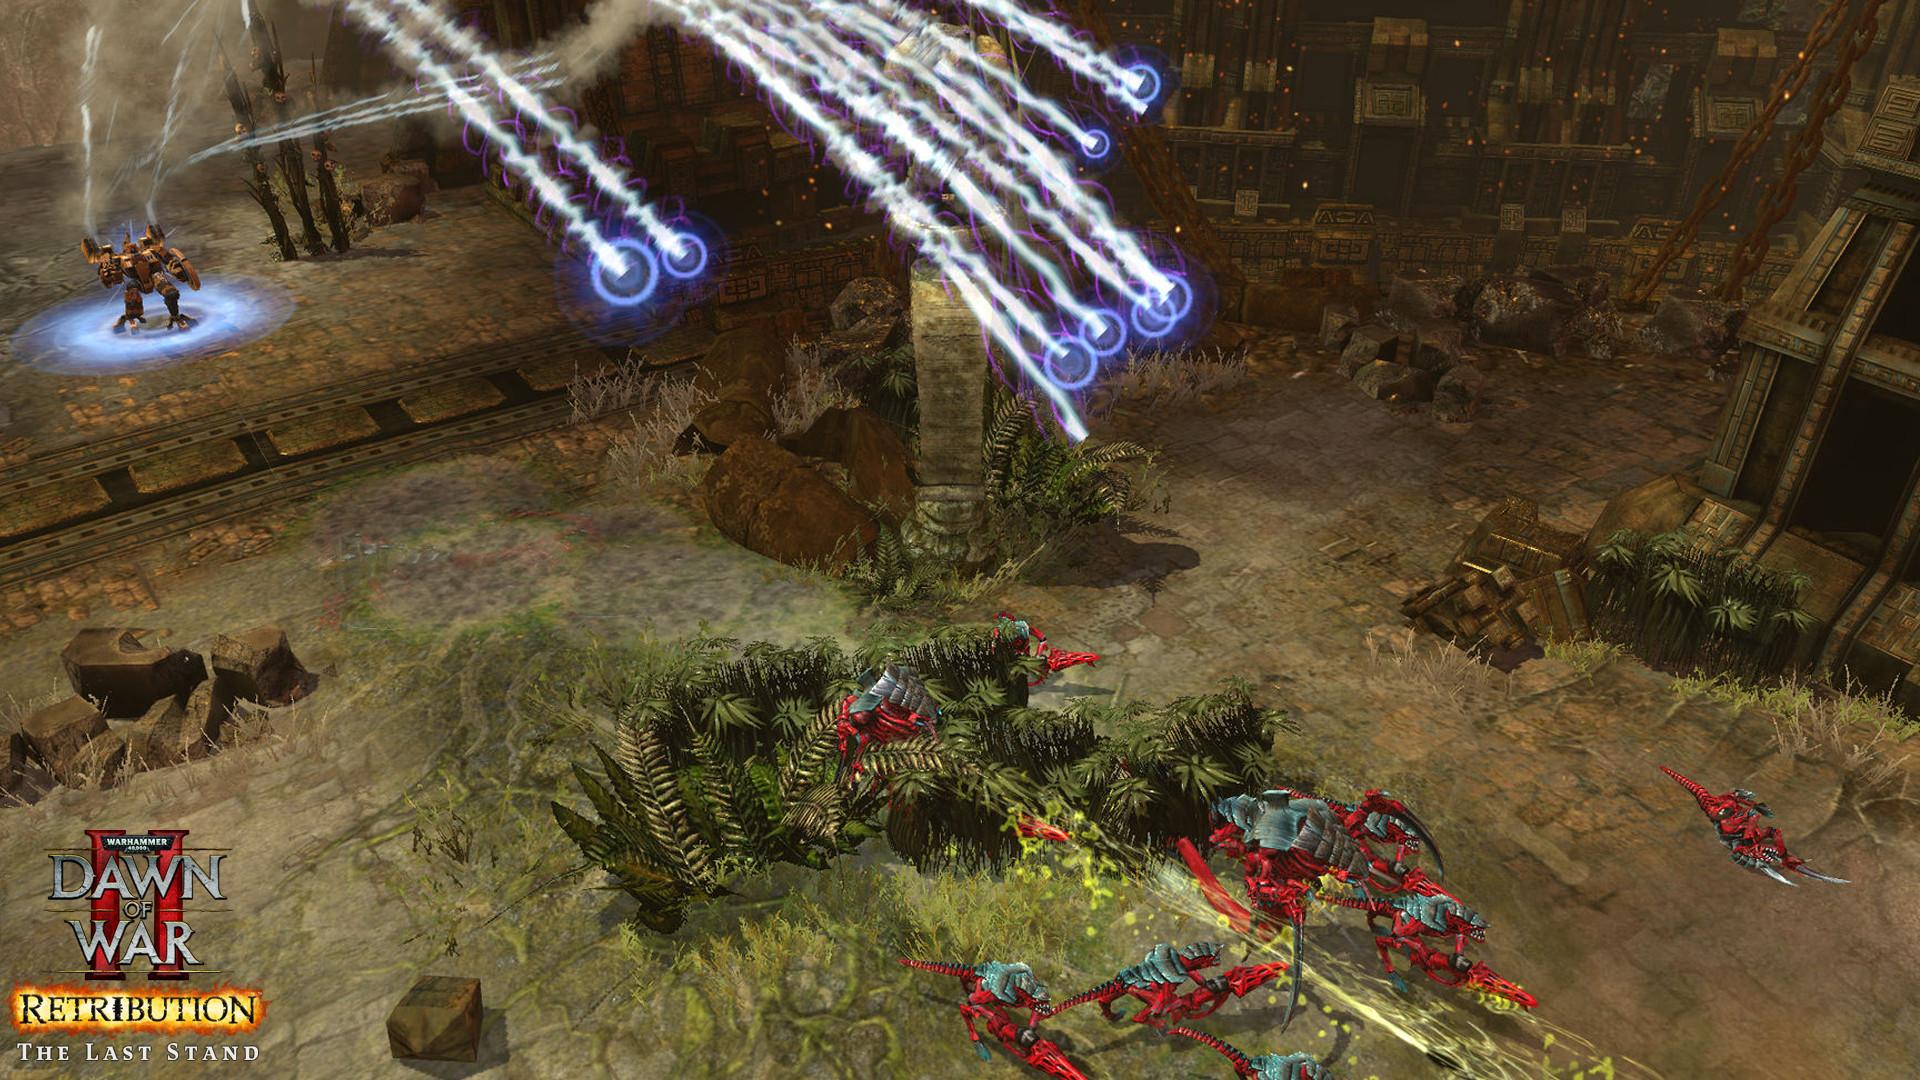 Warhammer 40,000: Dawn of War II - Retribution - The Last Stand Tau Commander screenshot